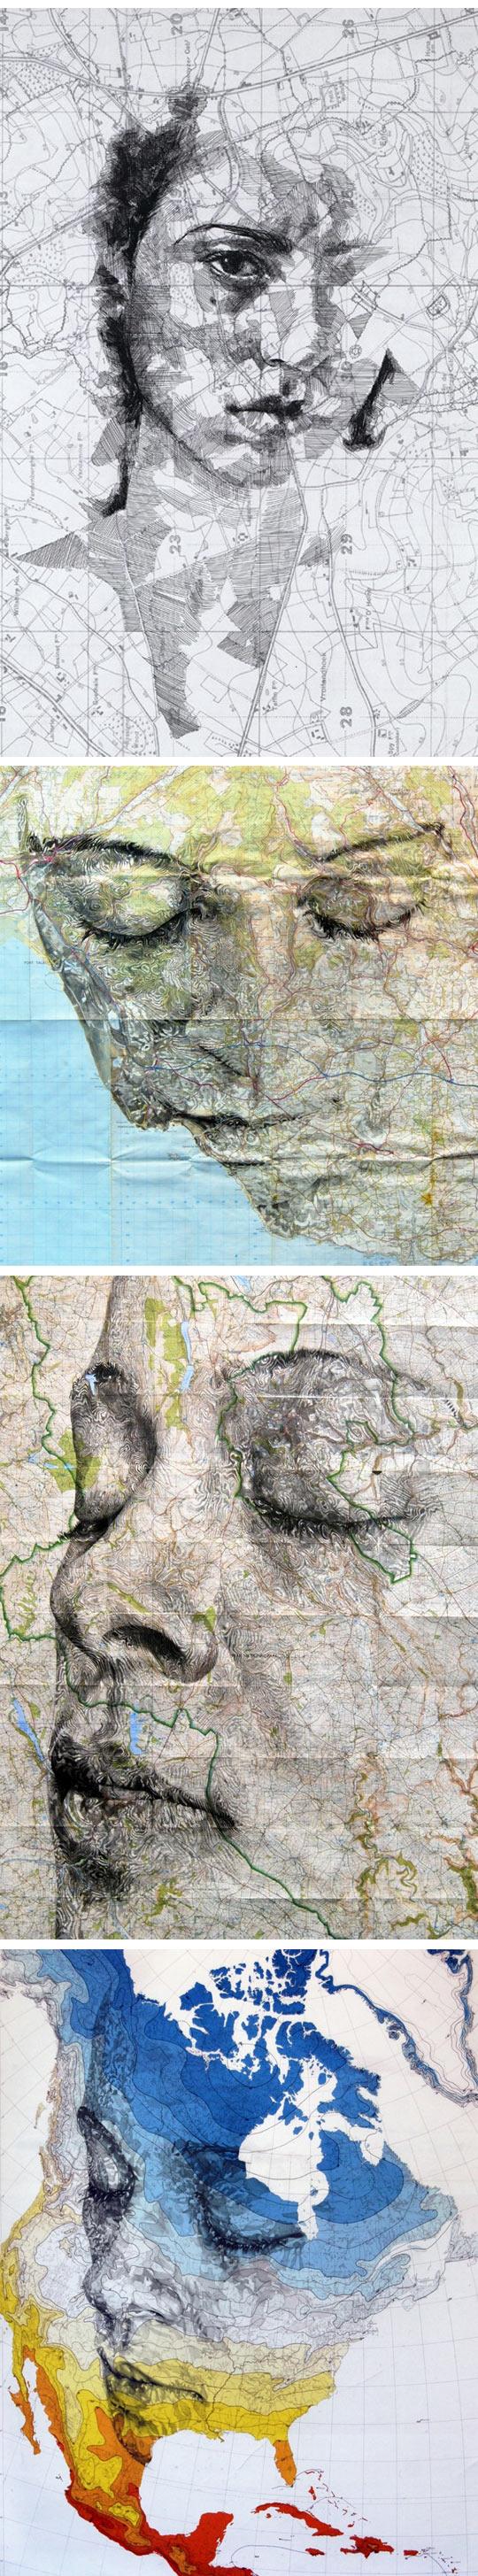 portraits-on-maps-2